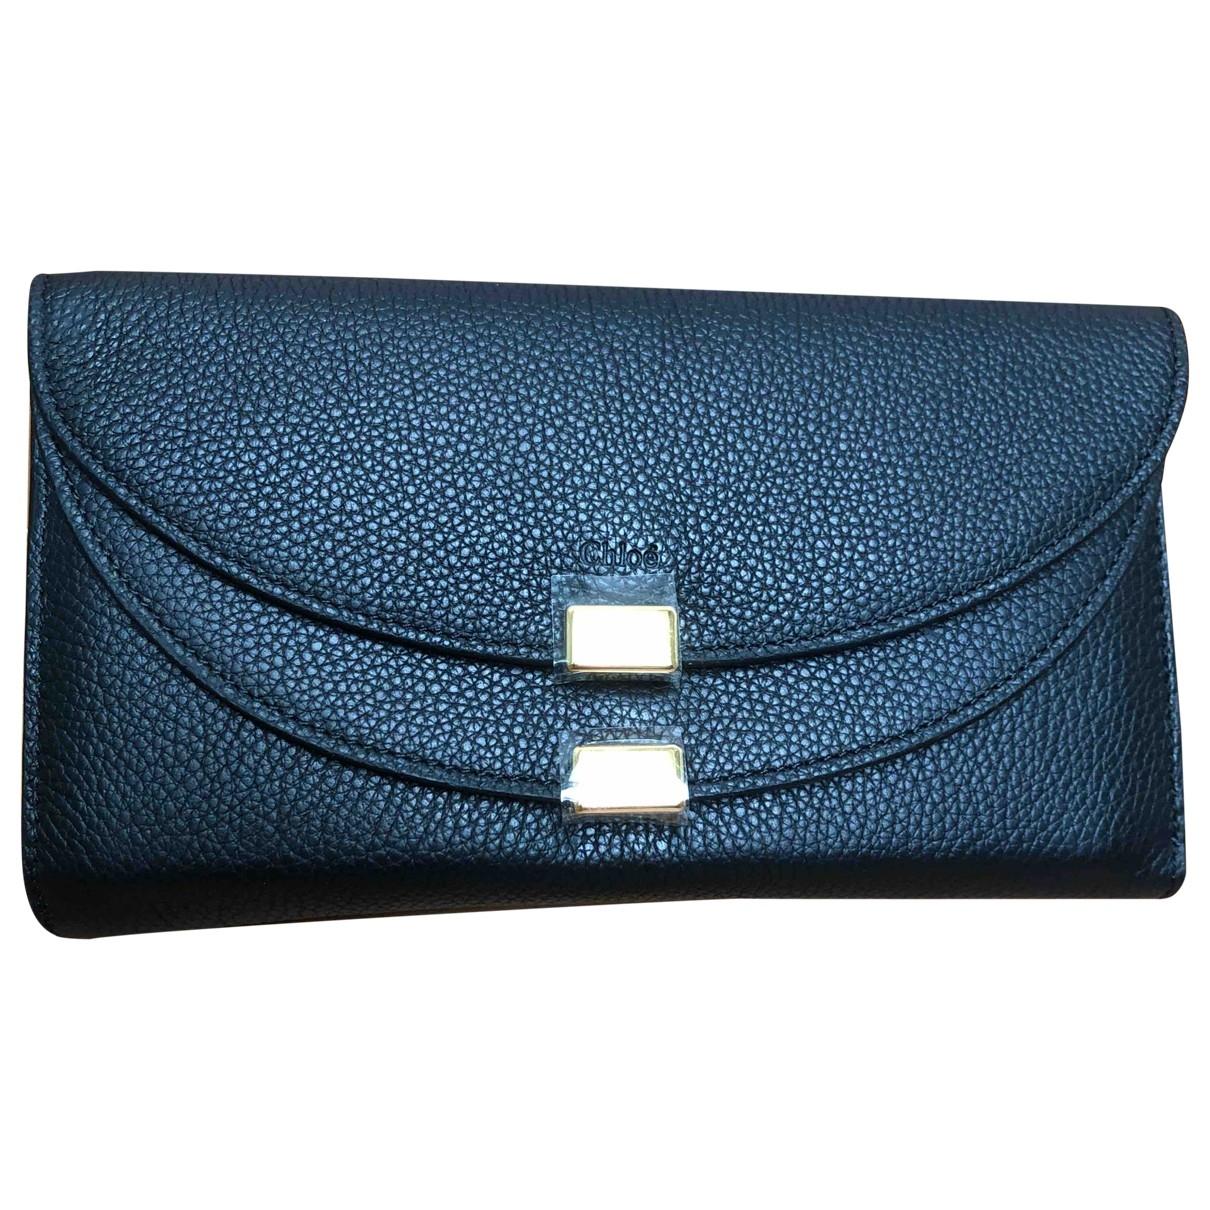 Chloé \N Black Leather wallet for Women \N